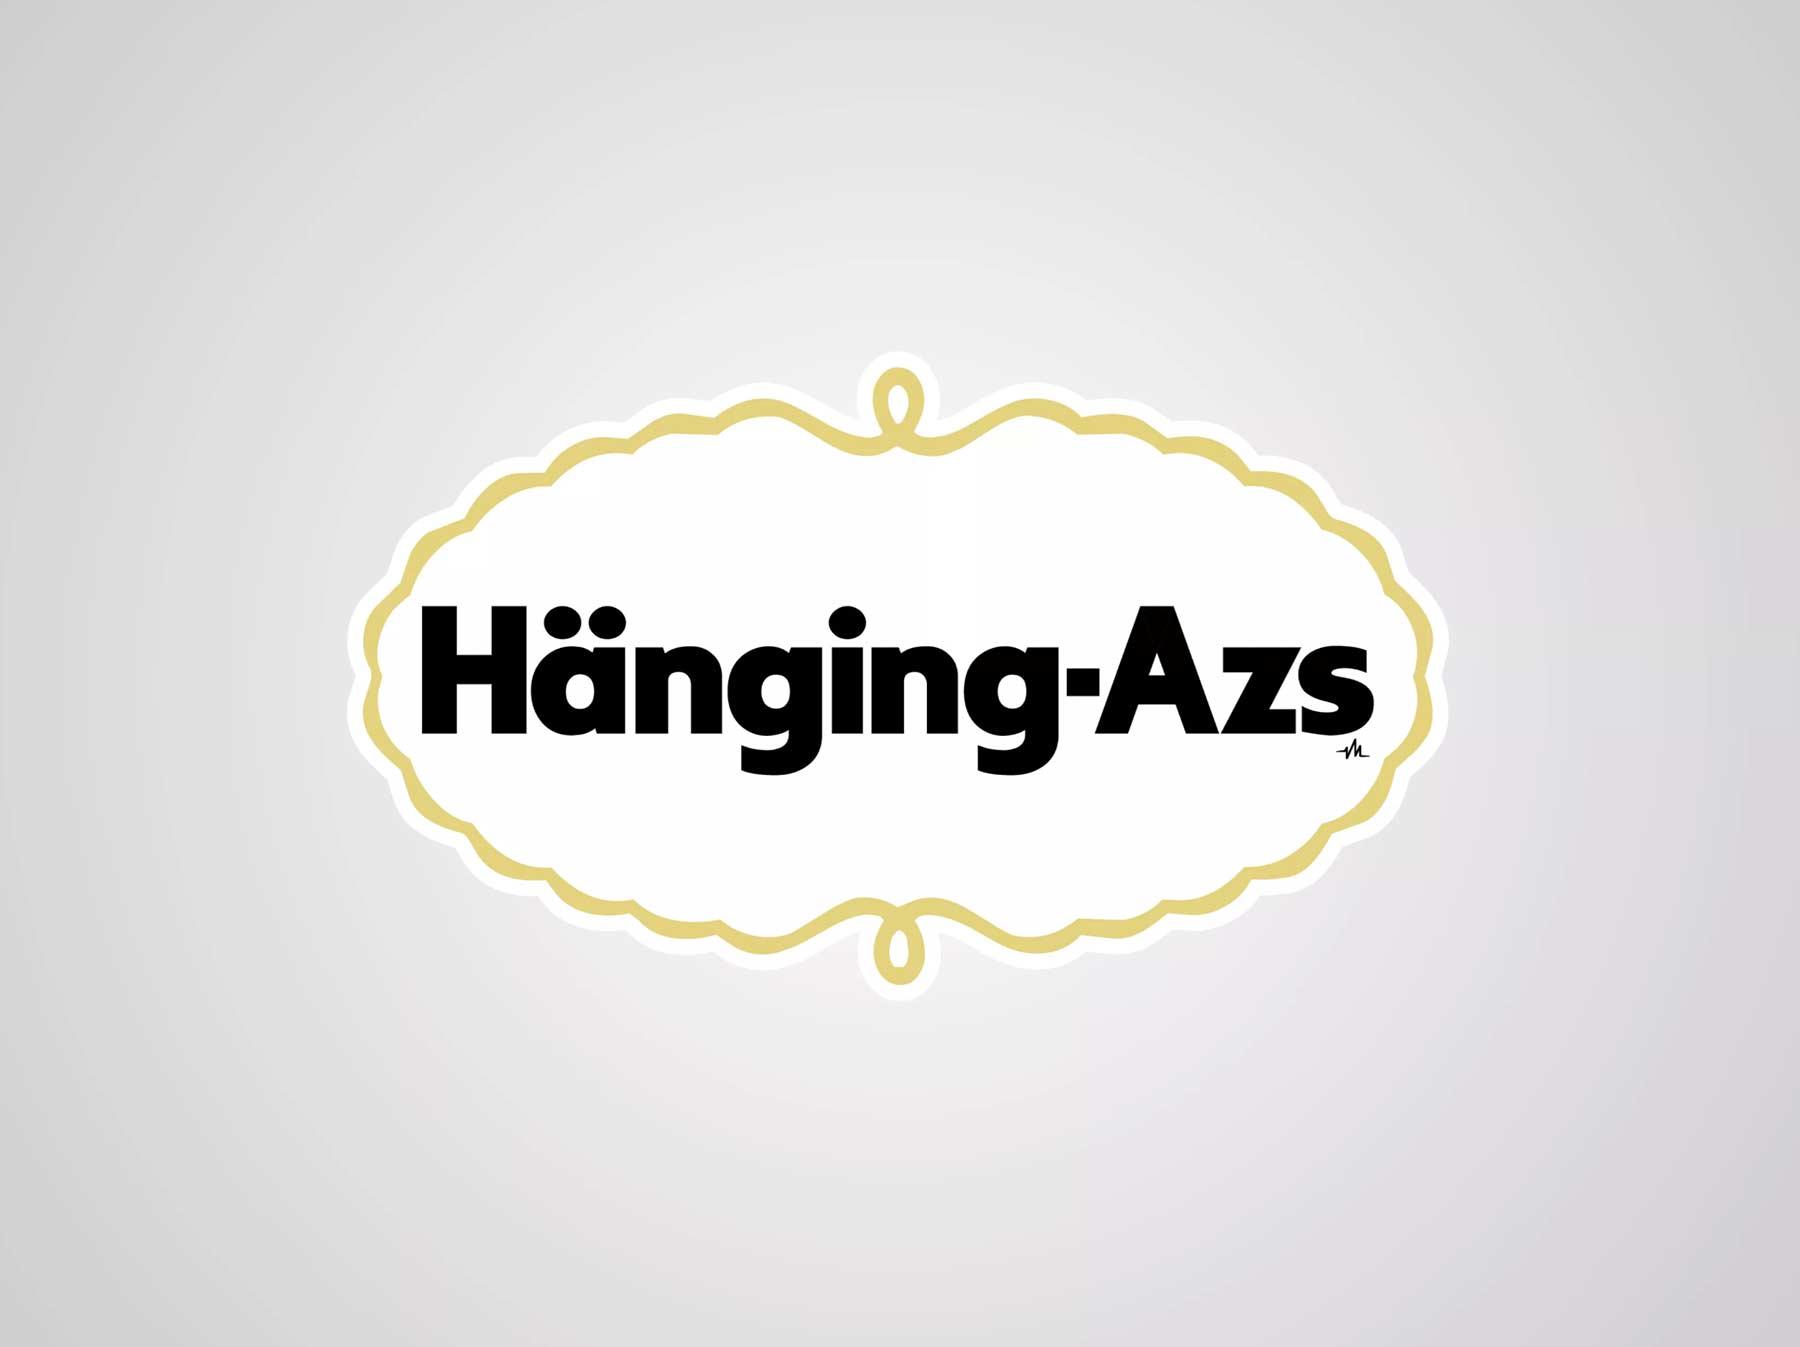 Neue ehrliche Markenlogos von Viktor Hertz Honest-Logos-3-Viktor-Hertz_09